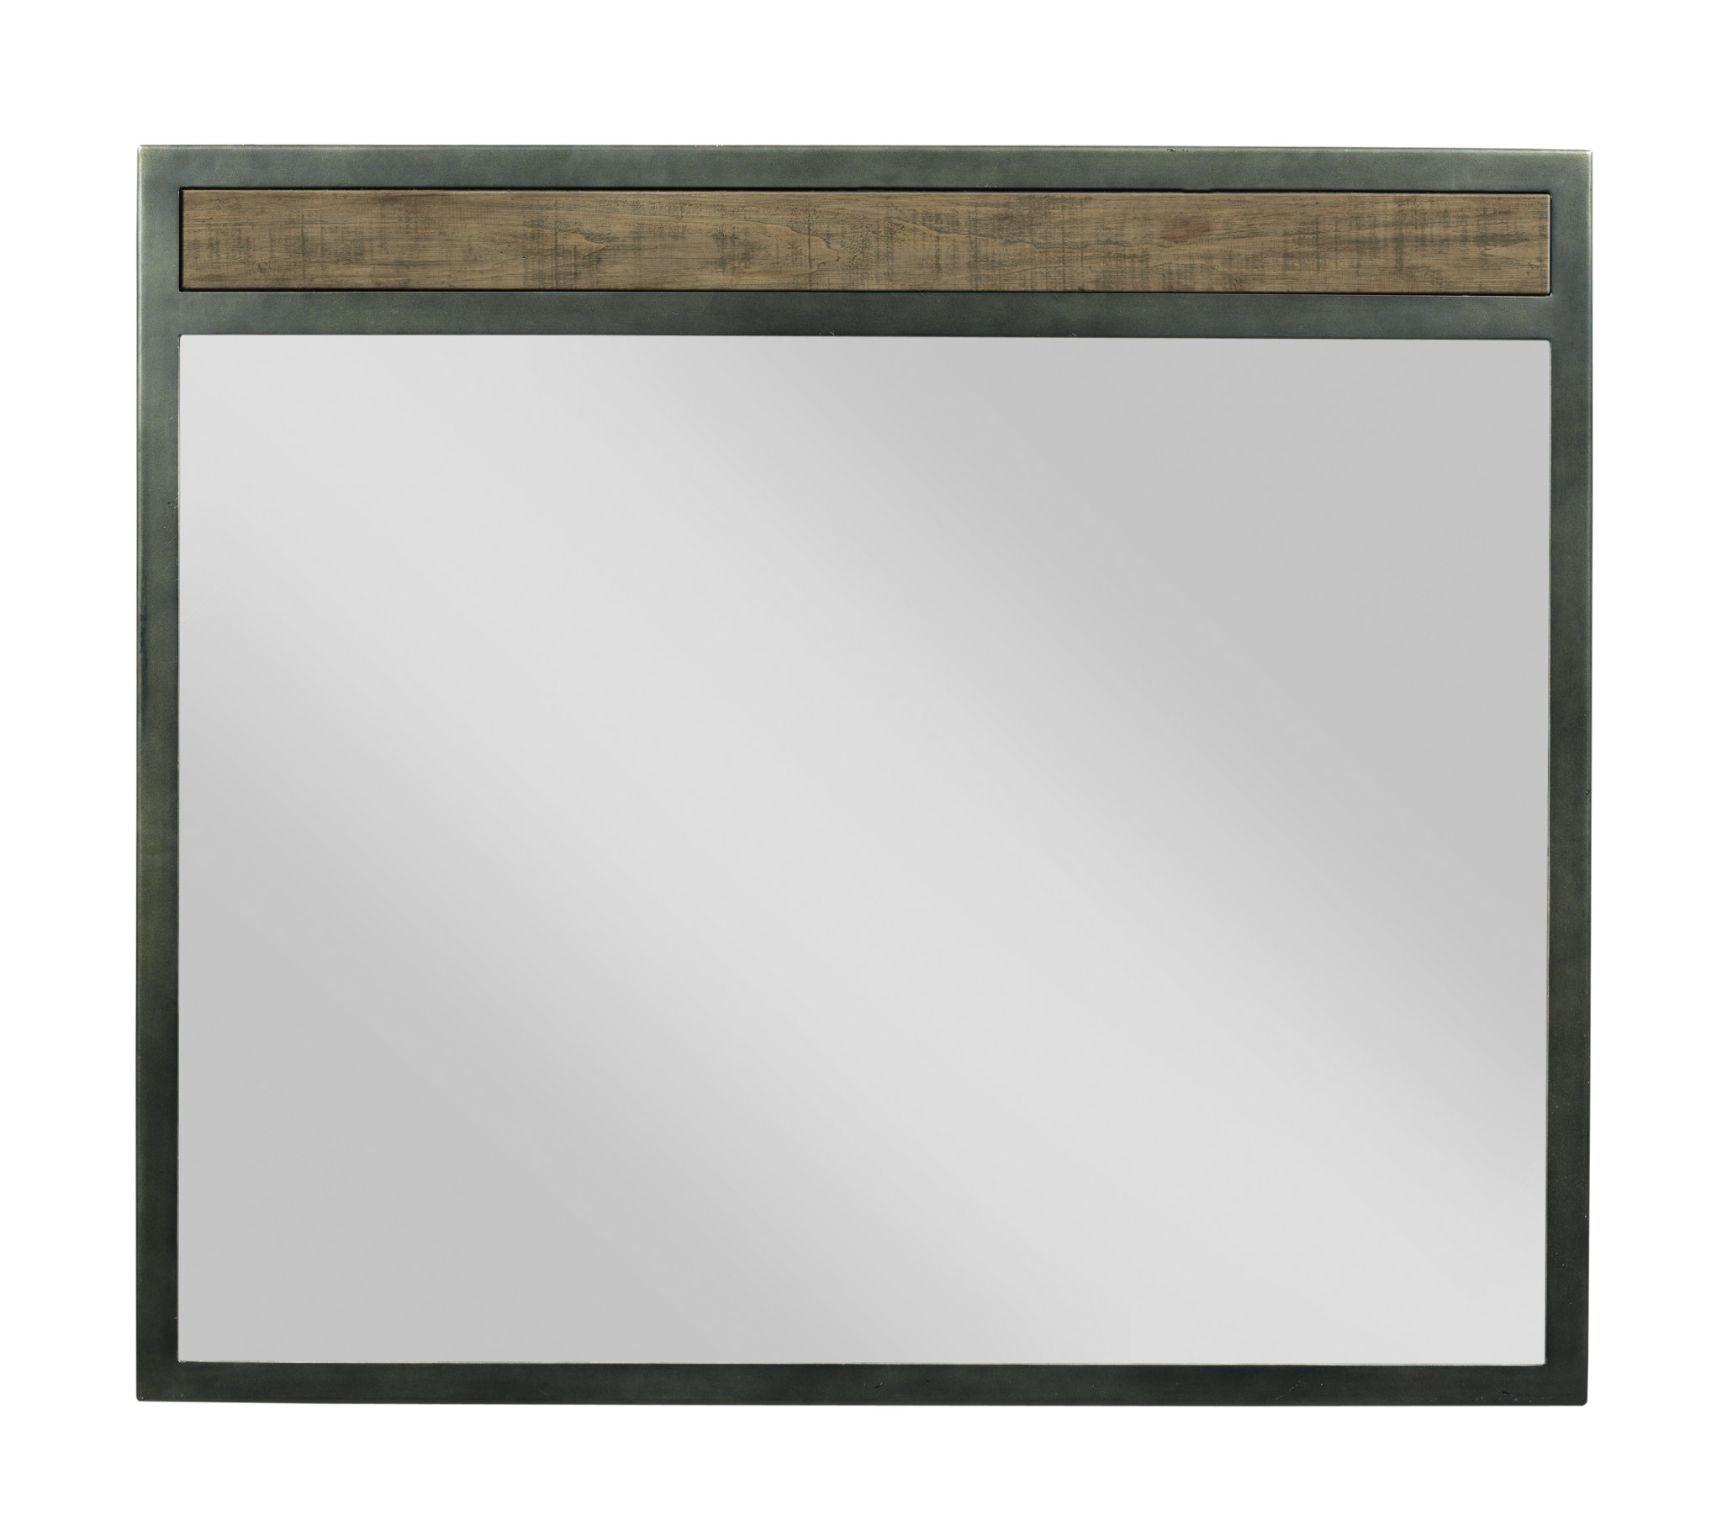 Genial Kincaid Furniture Shelley Mirror 706 020S